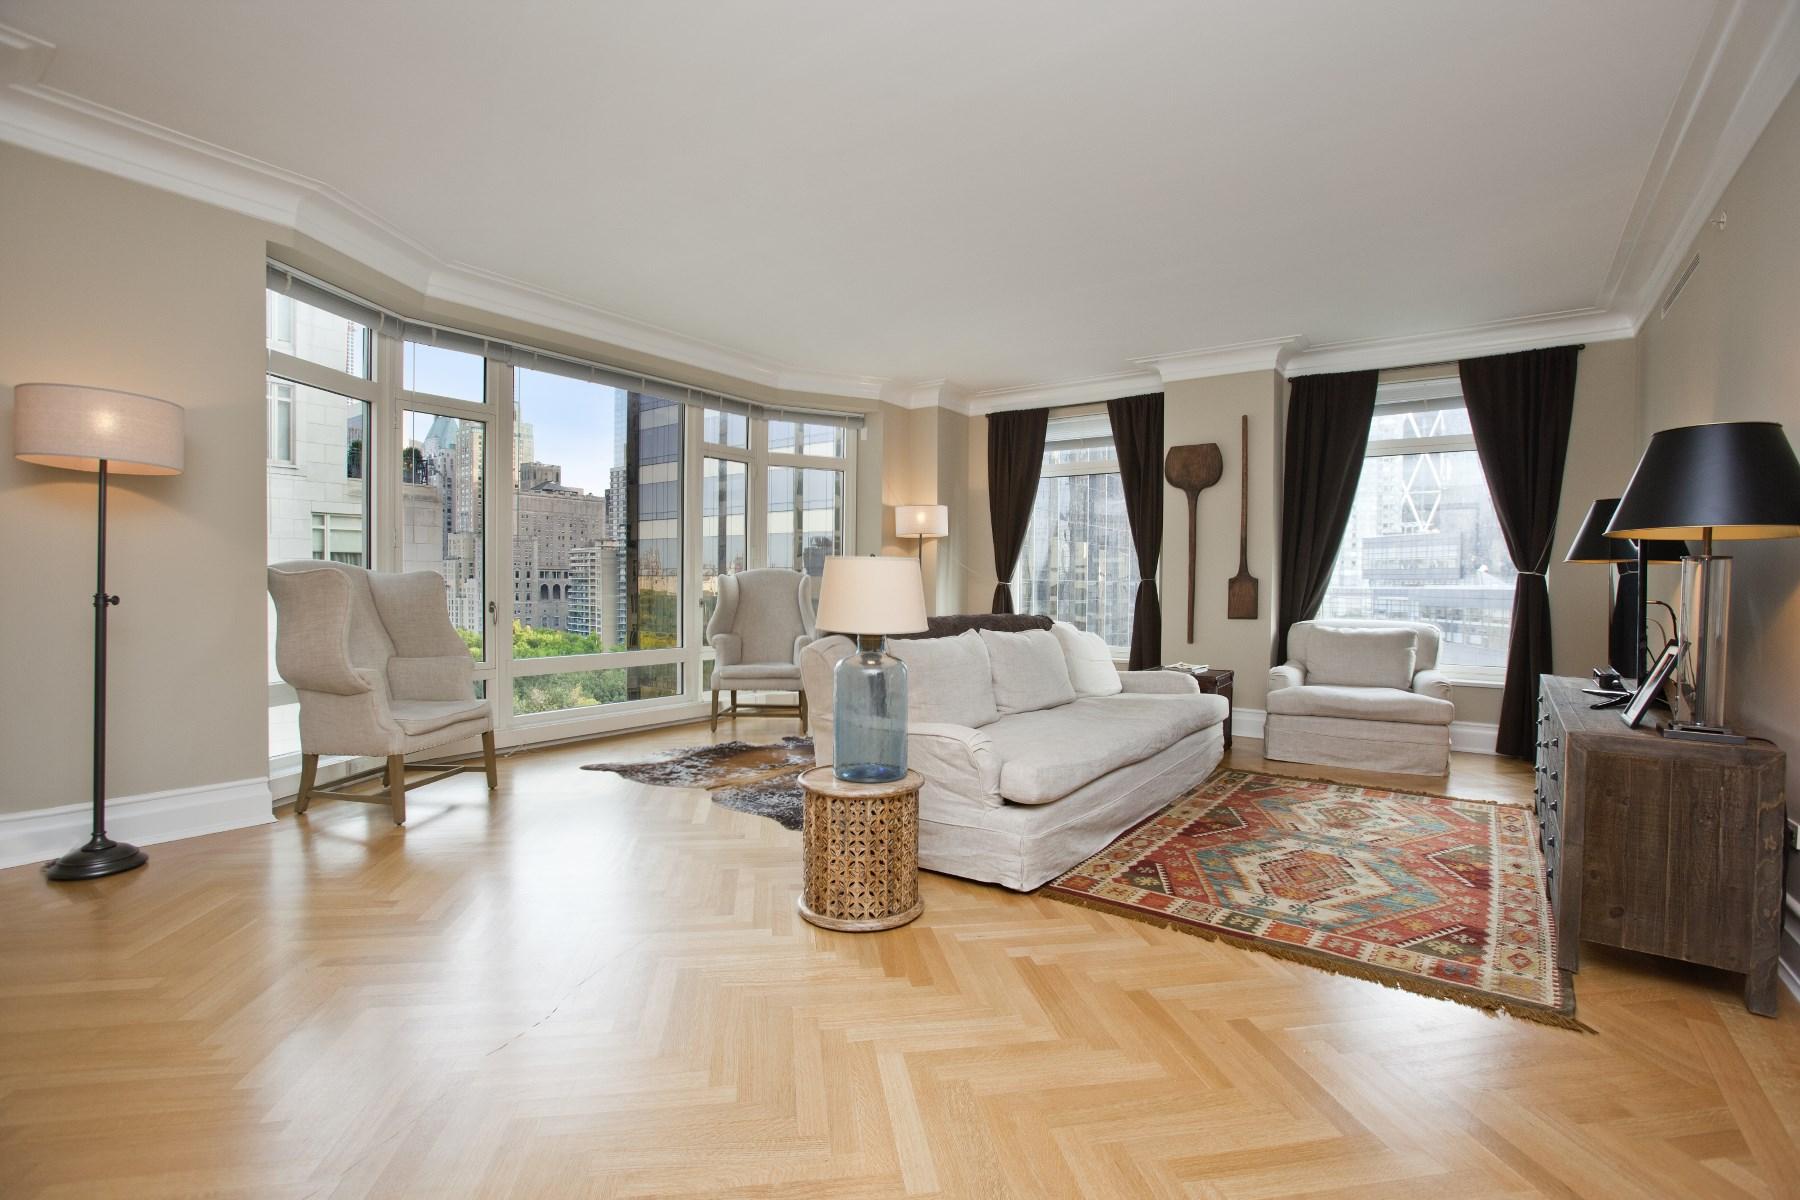 Condominium for Rent at 15 Central Park West, Apt 15G 15 Central Park West Apt 15g Upper West Side, New York, New York 10023 United States